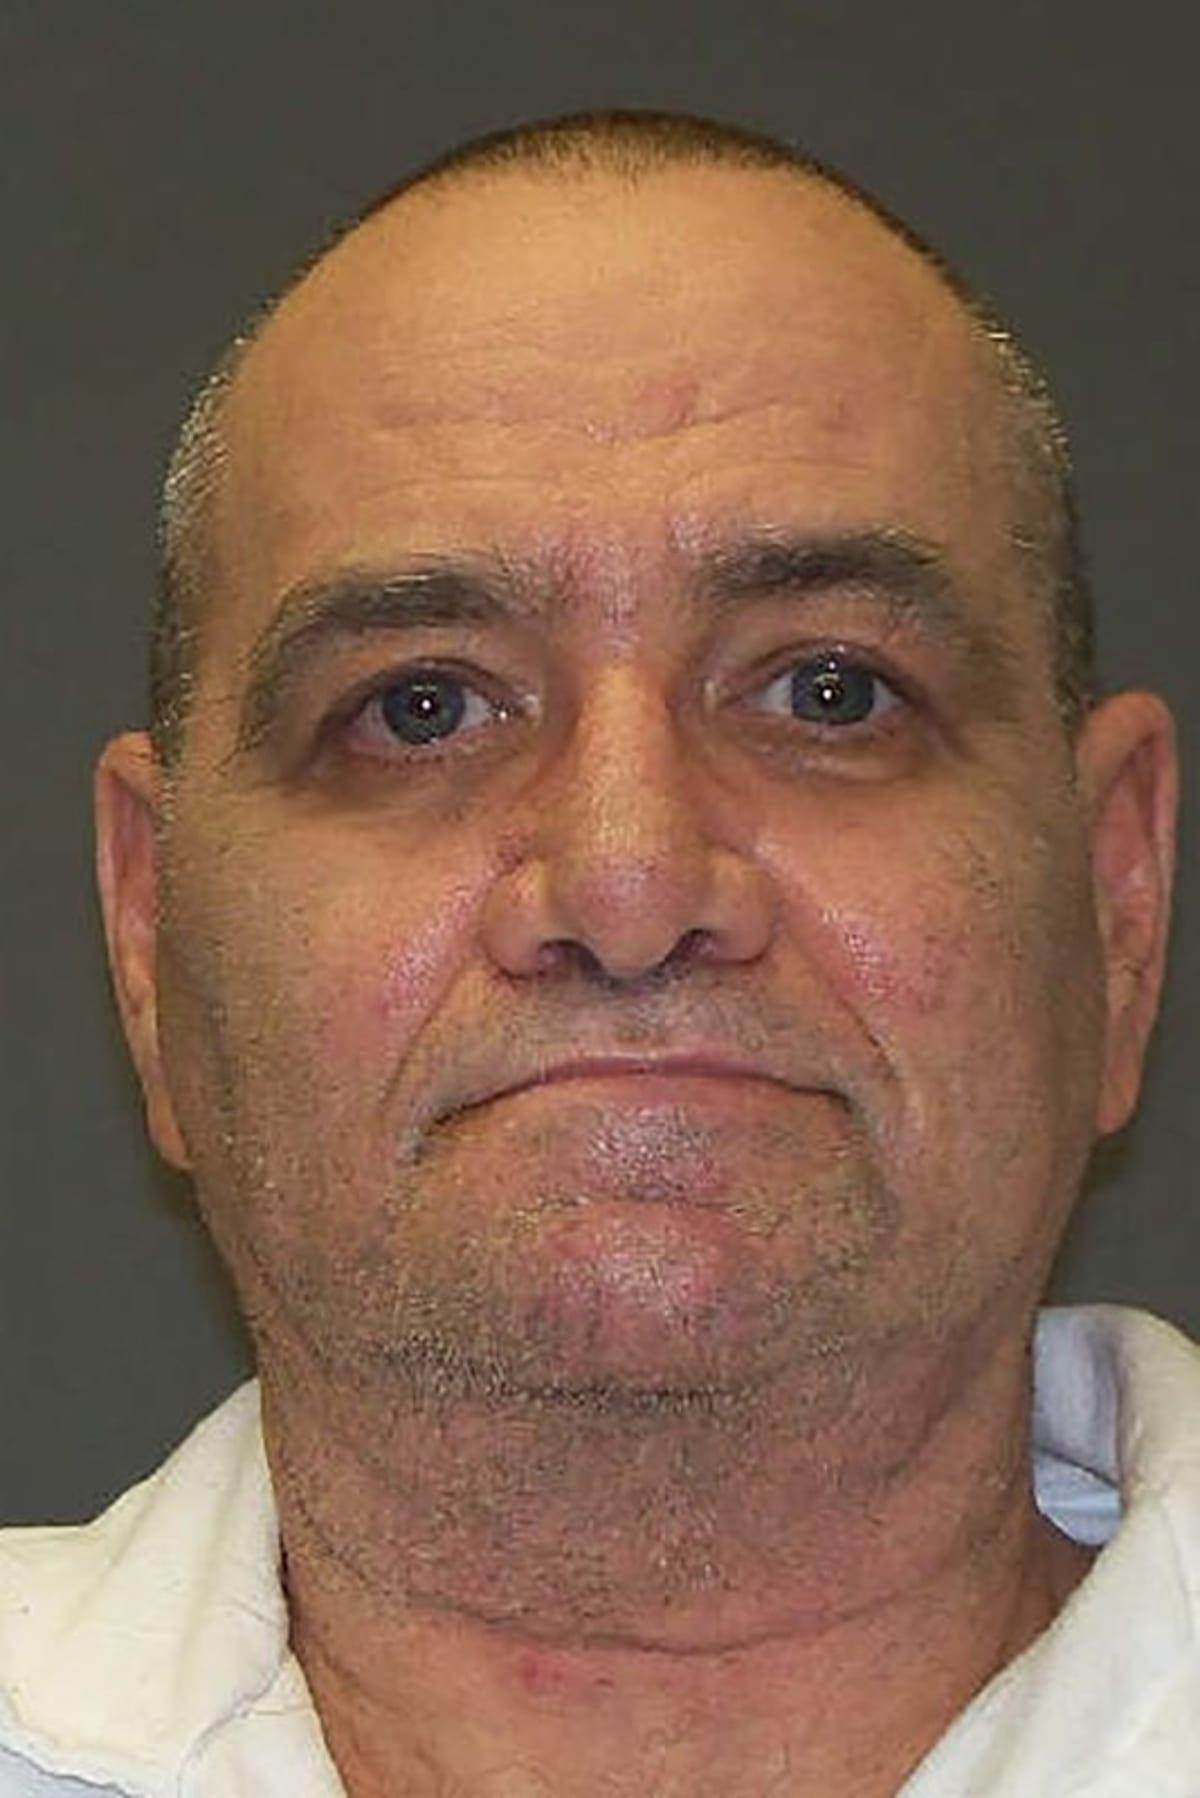 Hombre de Texas ejecutado por asesinar a esposa se disculpa con su familia